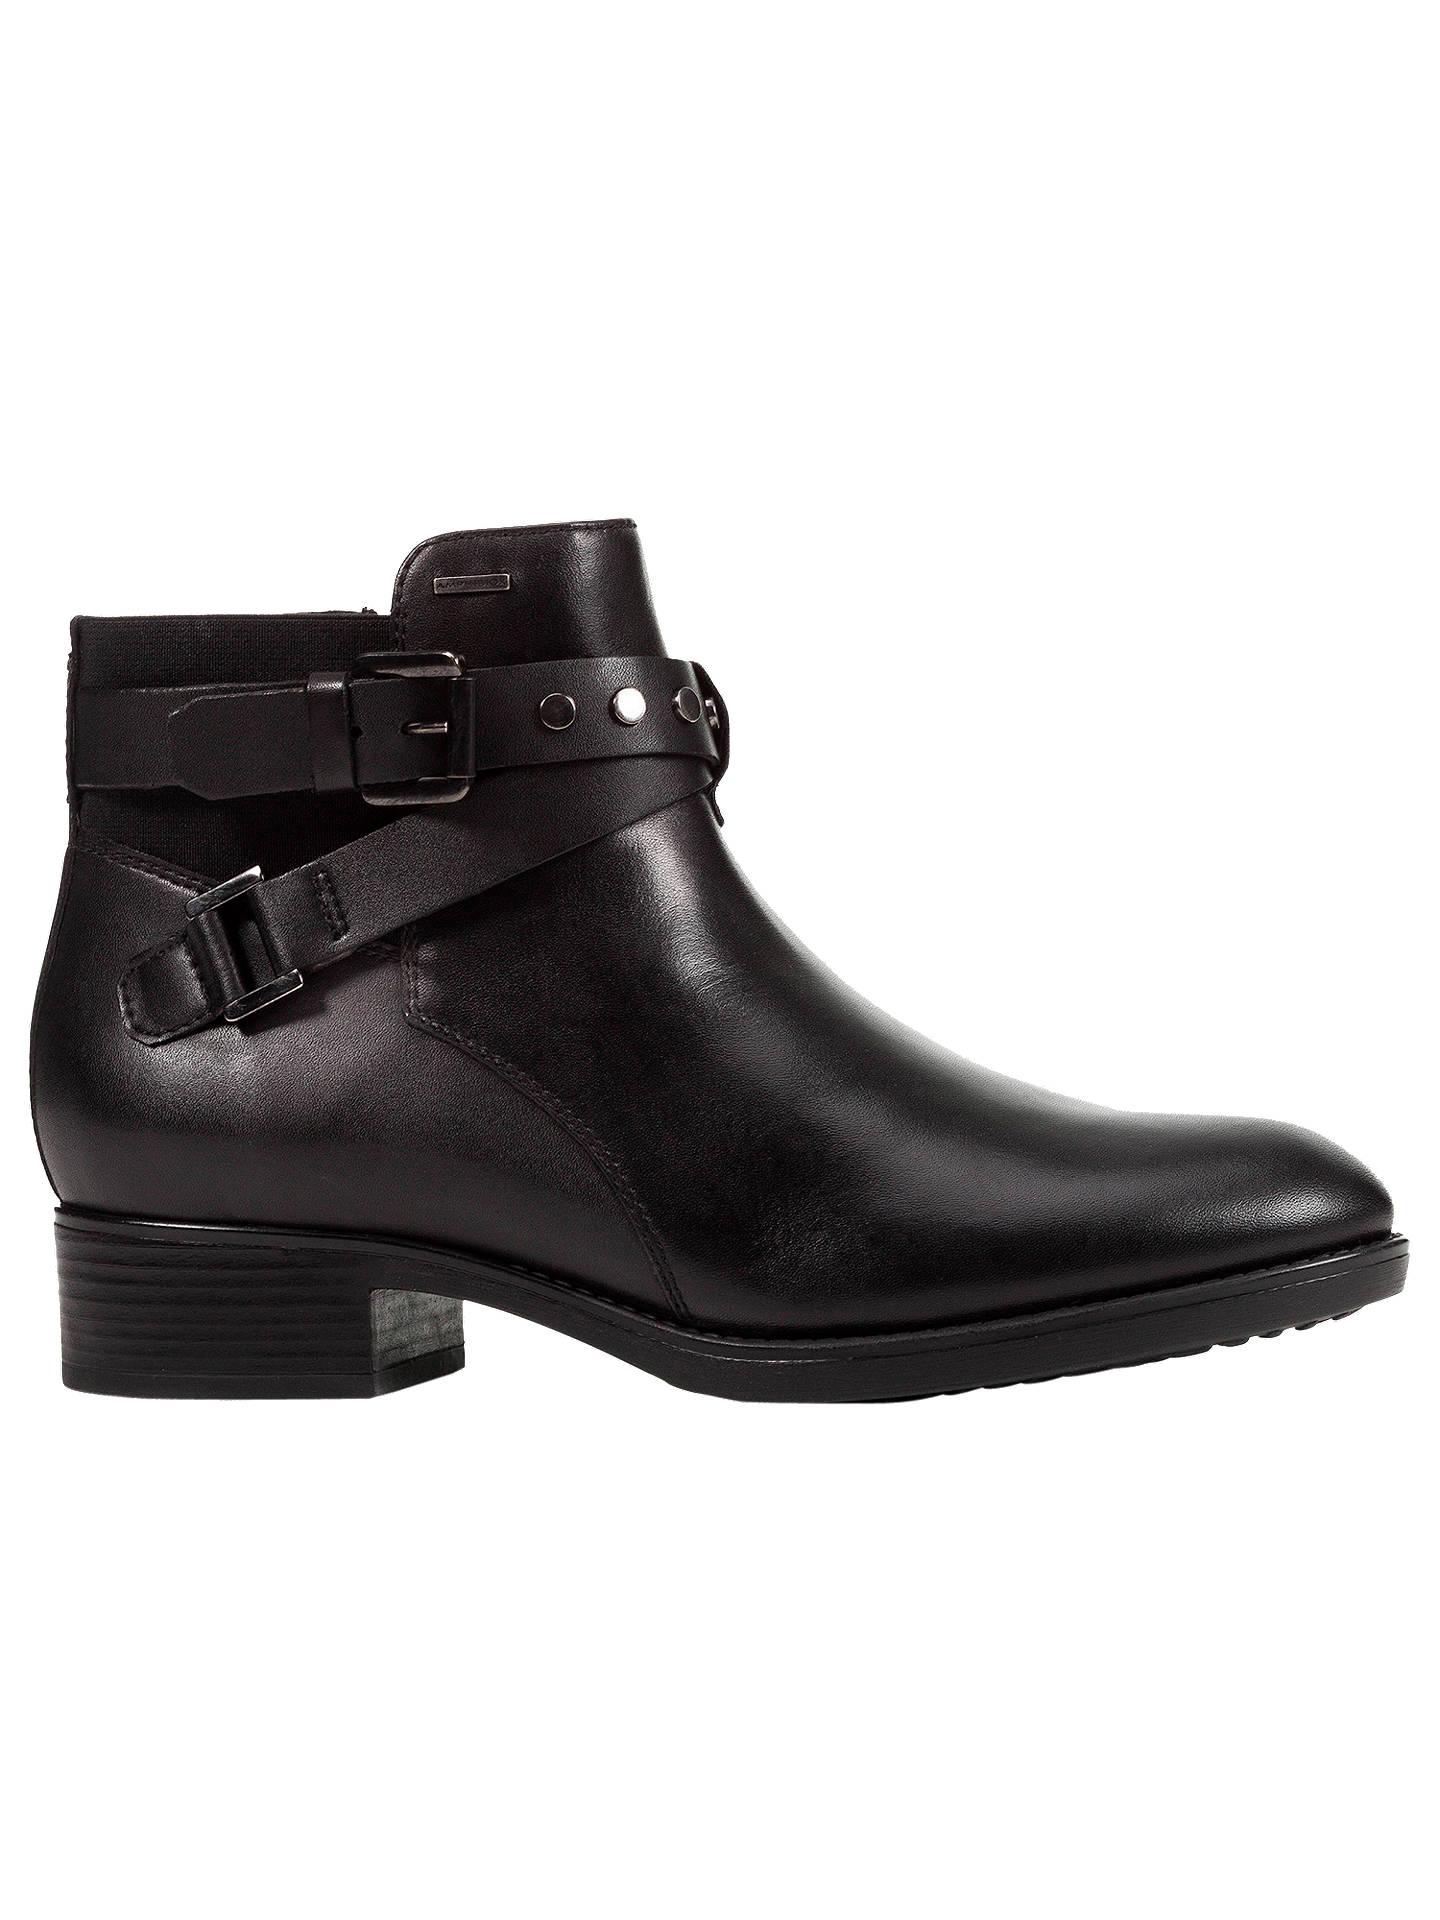 282b37df85134 Buy Geox Women's Felicity Napa Block Heel Ankle Boots, Black Leather, 5  Online at ...